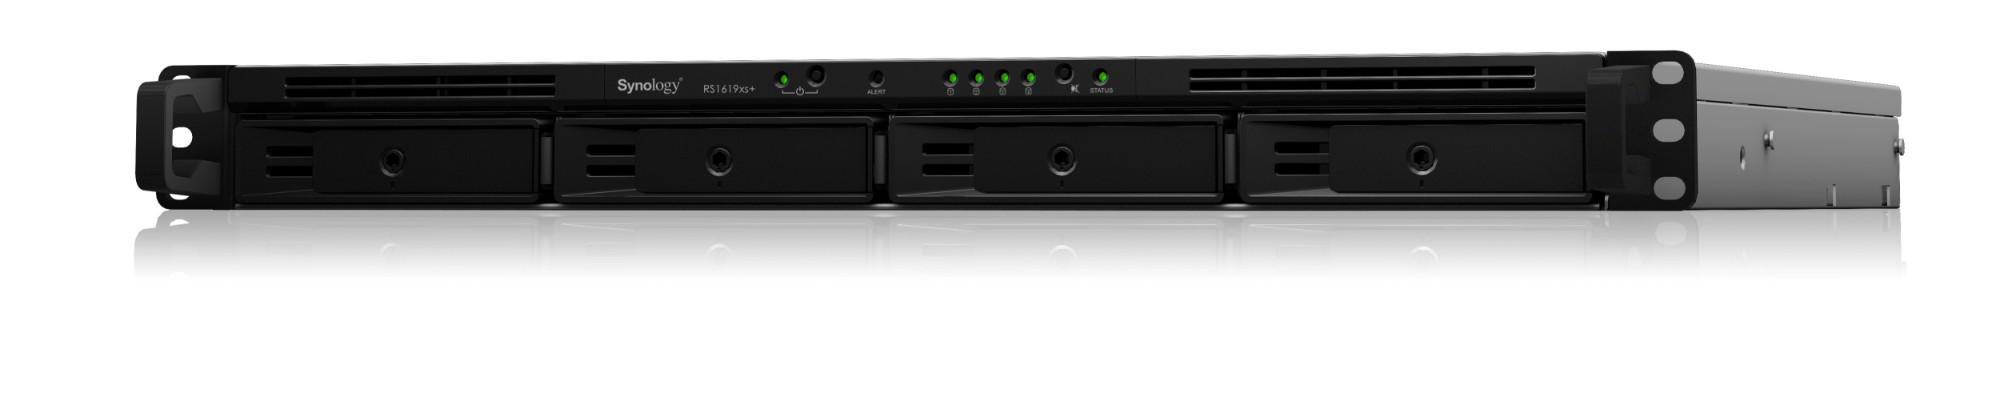 Synology RS1619xs+/40TB-TE 4 Bay NAS RS1619XS+/40TB-TE